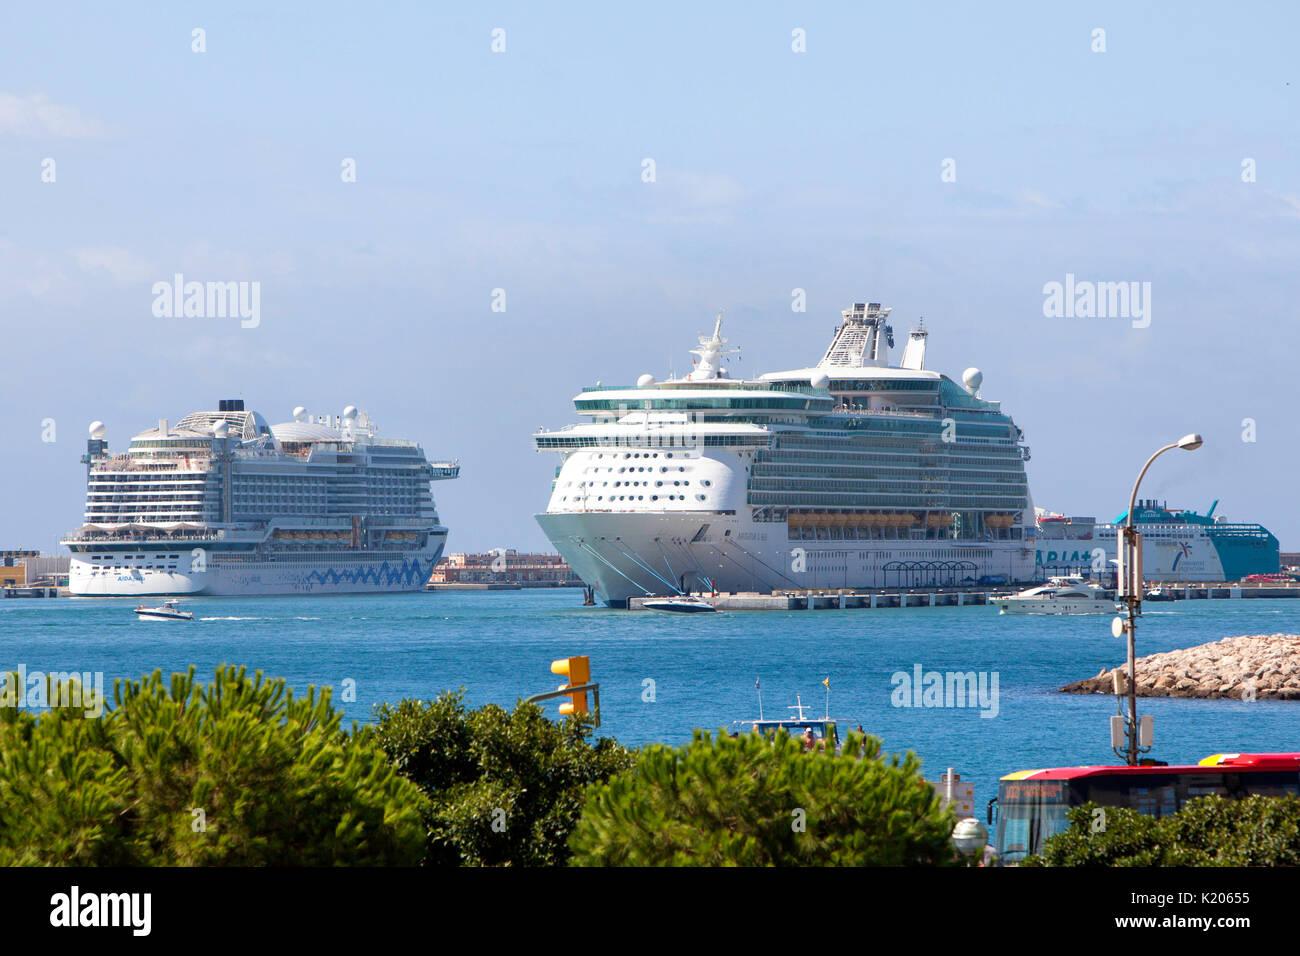 Royal Caribbean Navigator of the Seas and AIDA Cruises AIDAperla cruise ships docked at Palma de Mallorca Spain in the western Mediterranean - Stock Image